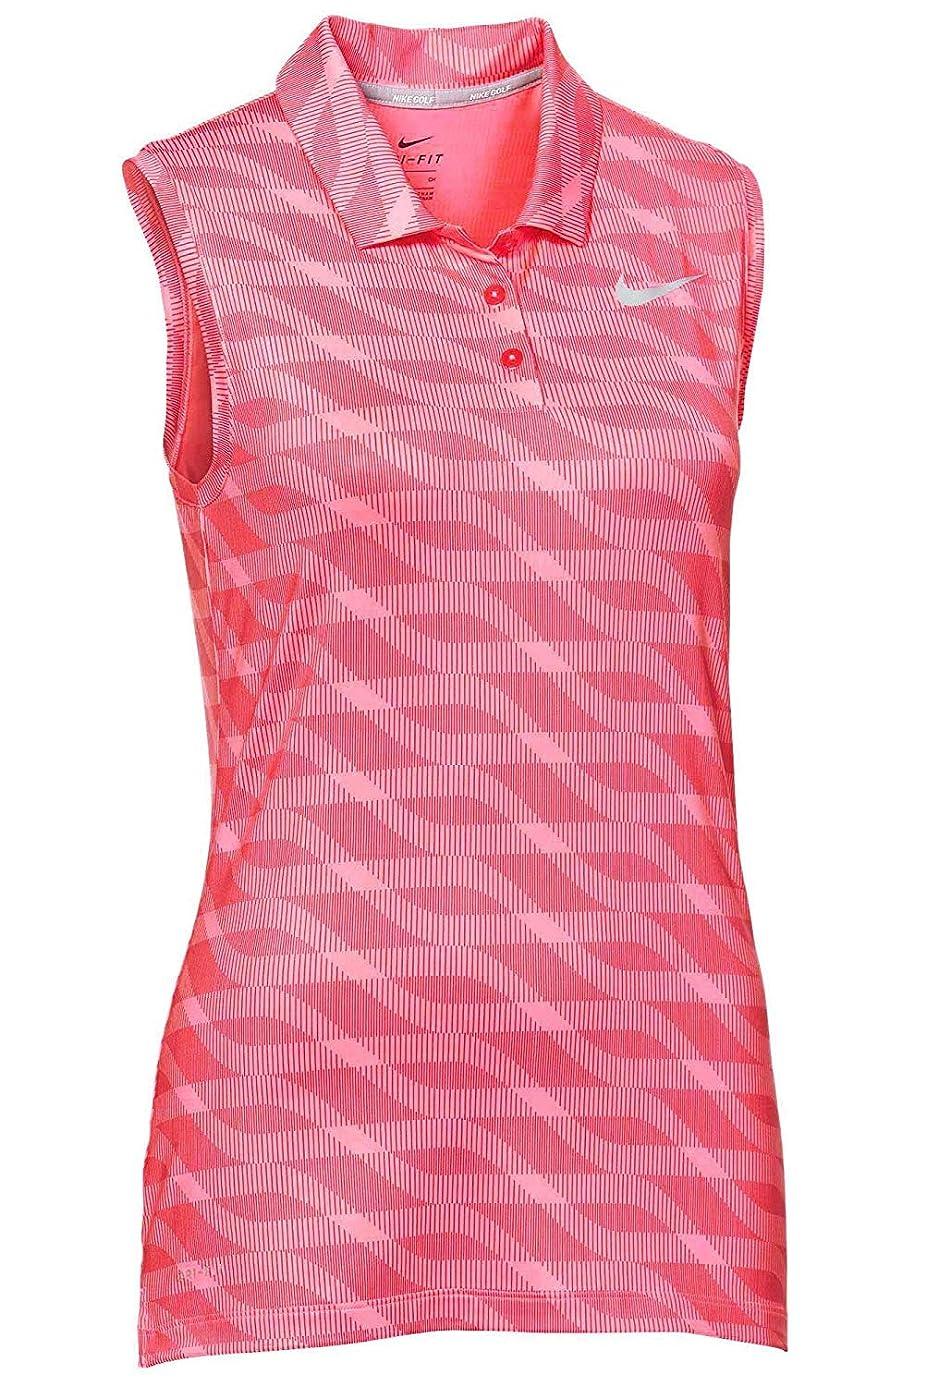 NIKE Women's Dry Sleeveless Golf Polo Sunset Pulse